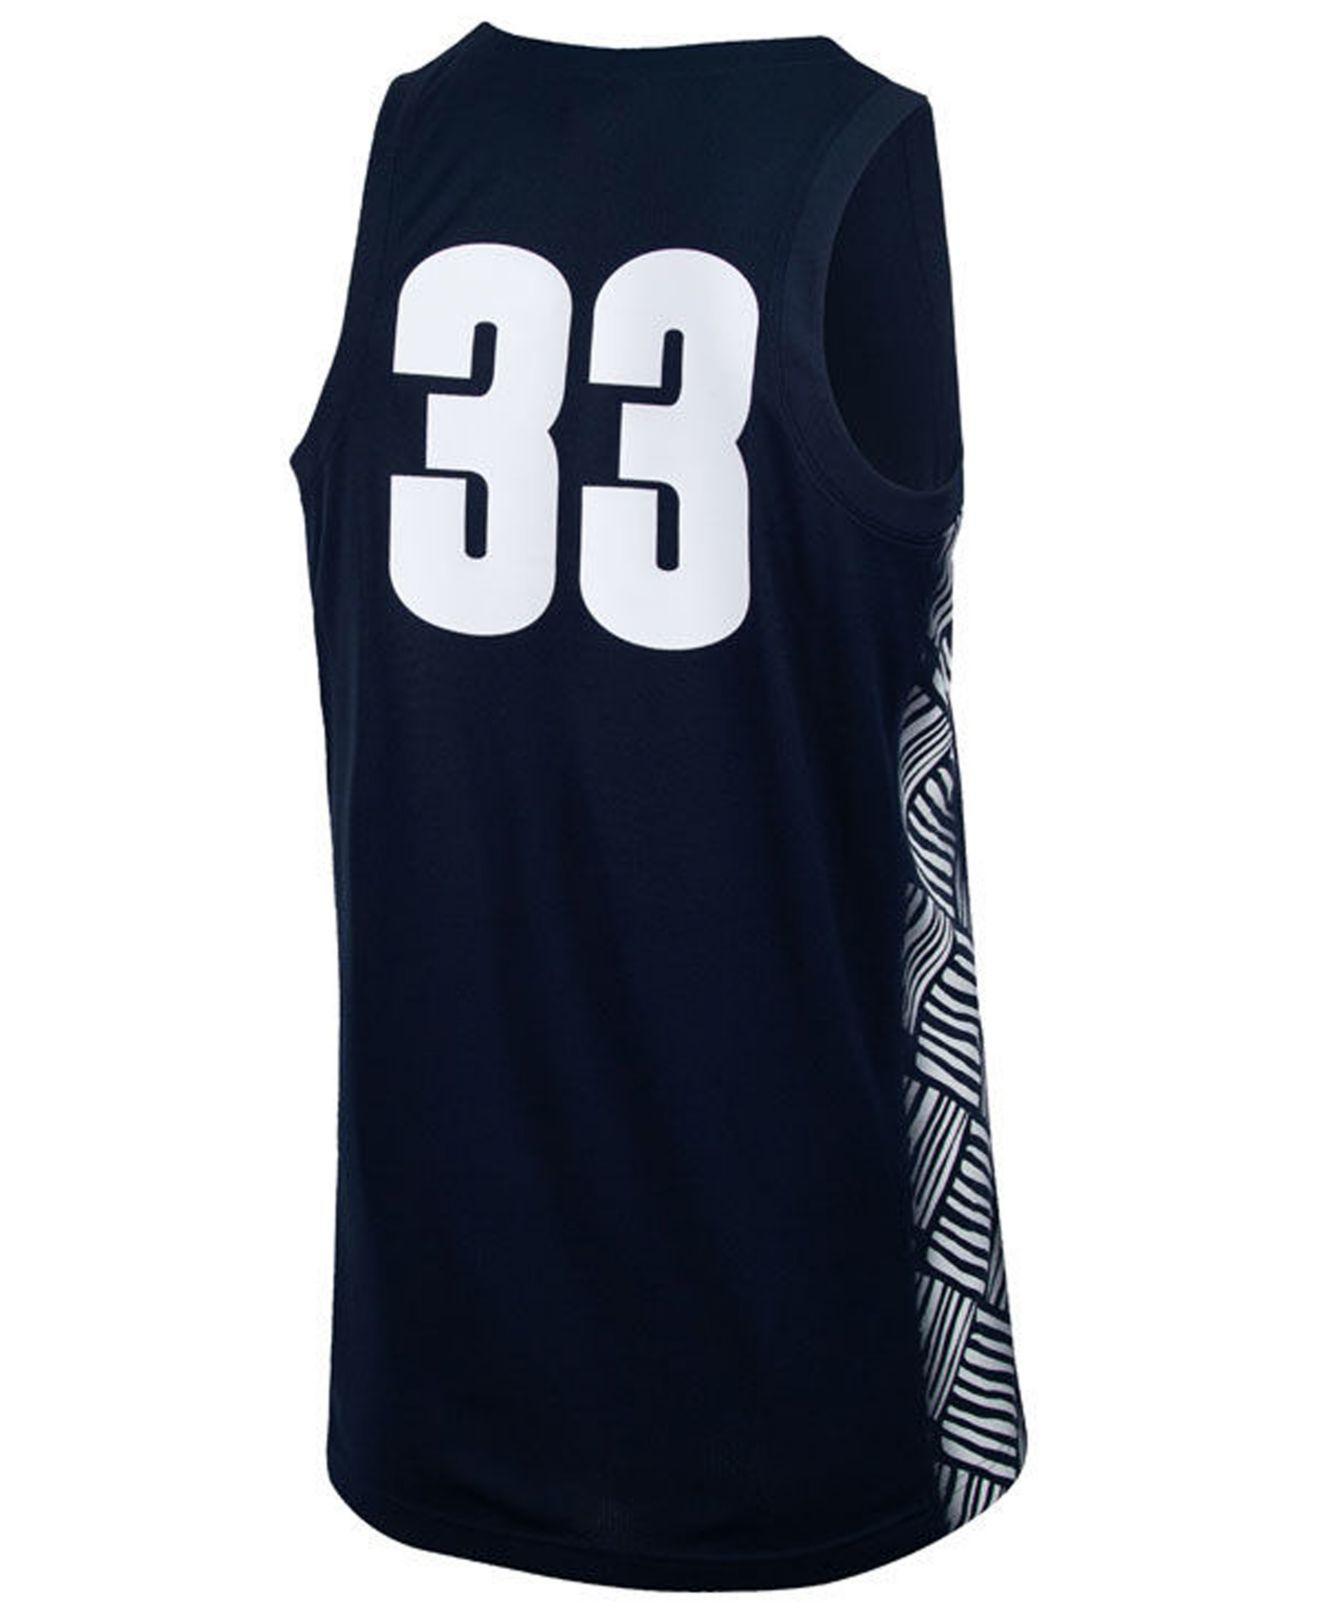 free shipping dc28b 7ec45 Men's Blue Georgetown Hoyas Replica Basketball Jersey